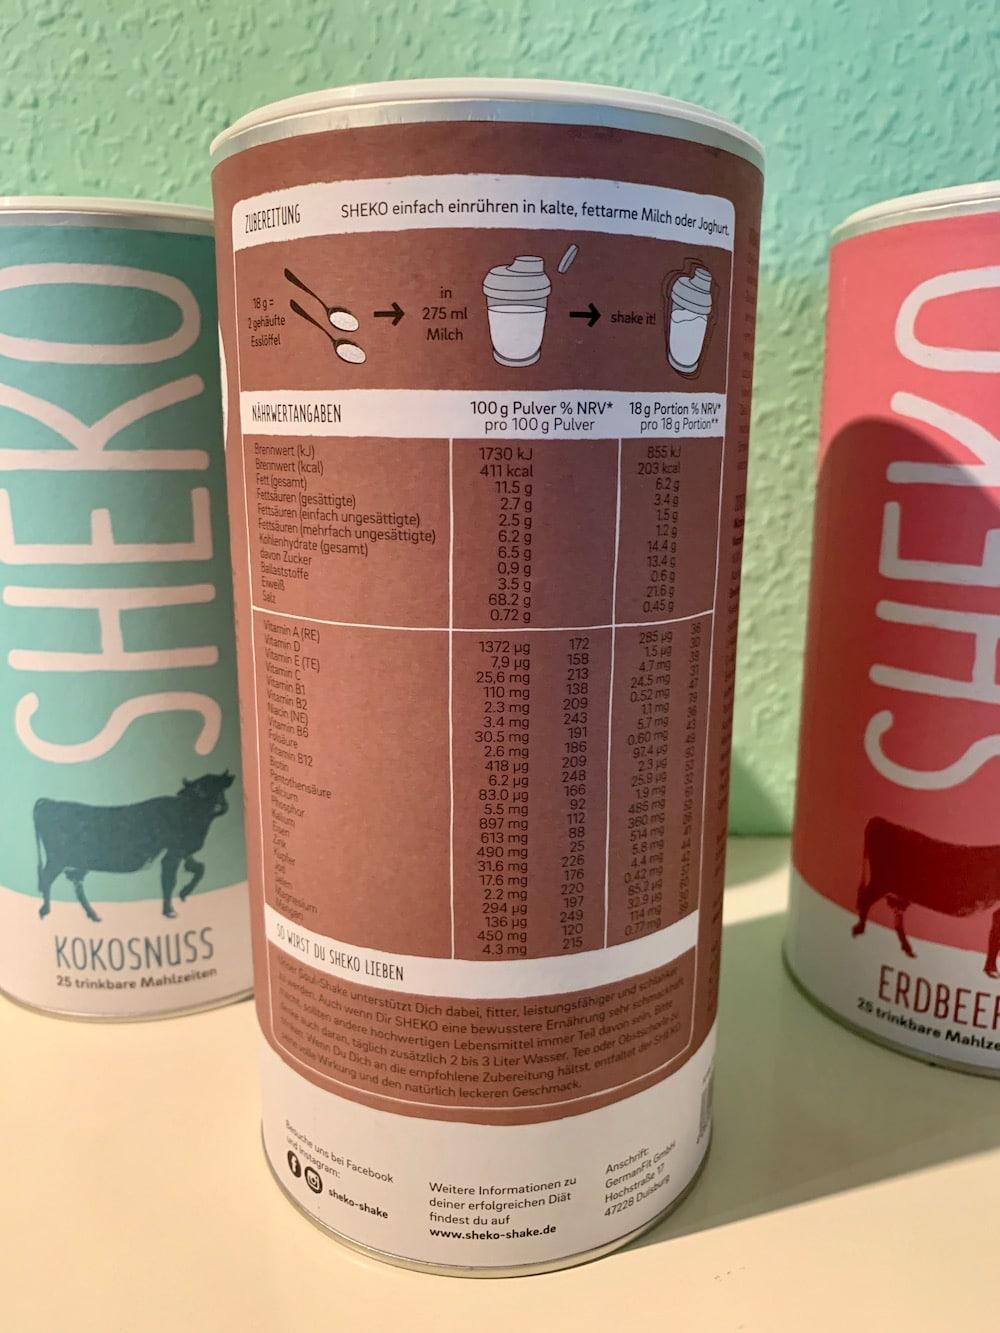 Sheko Shake Inhaltsstoffe